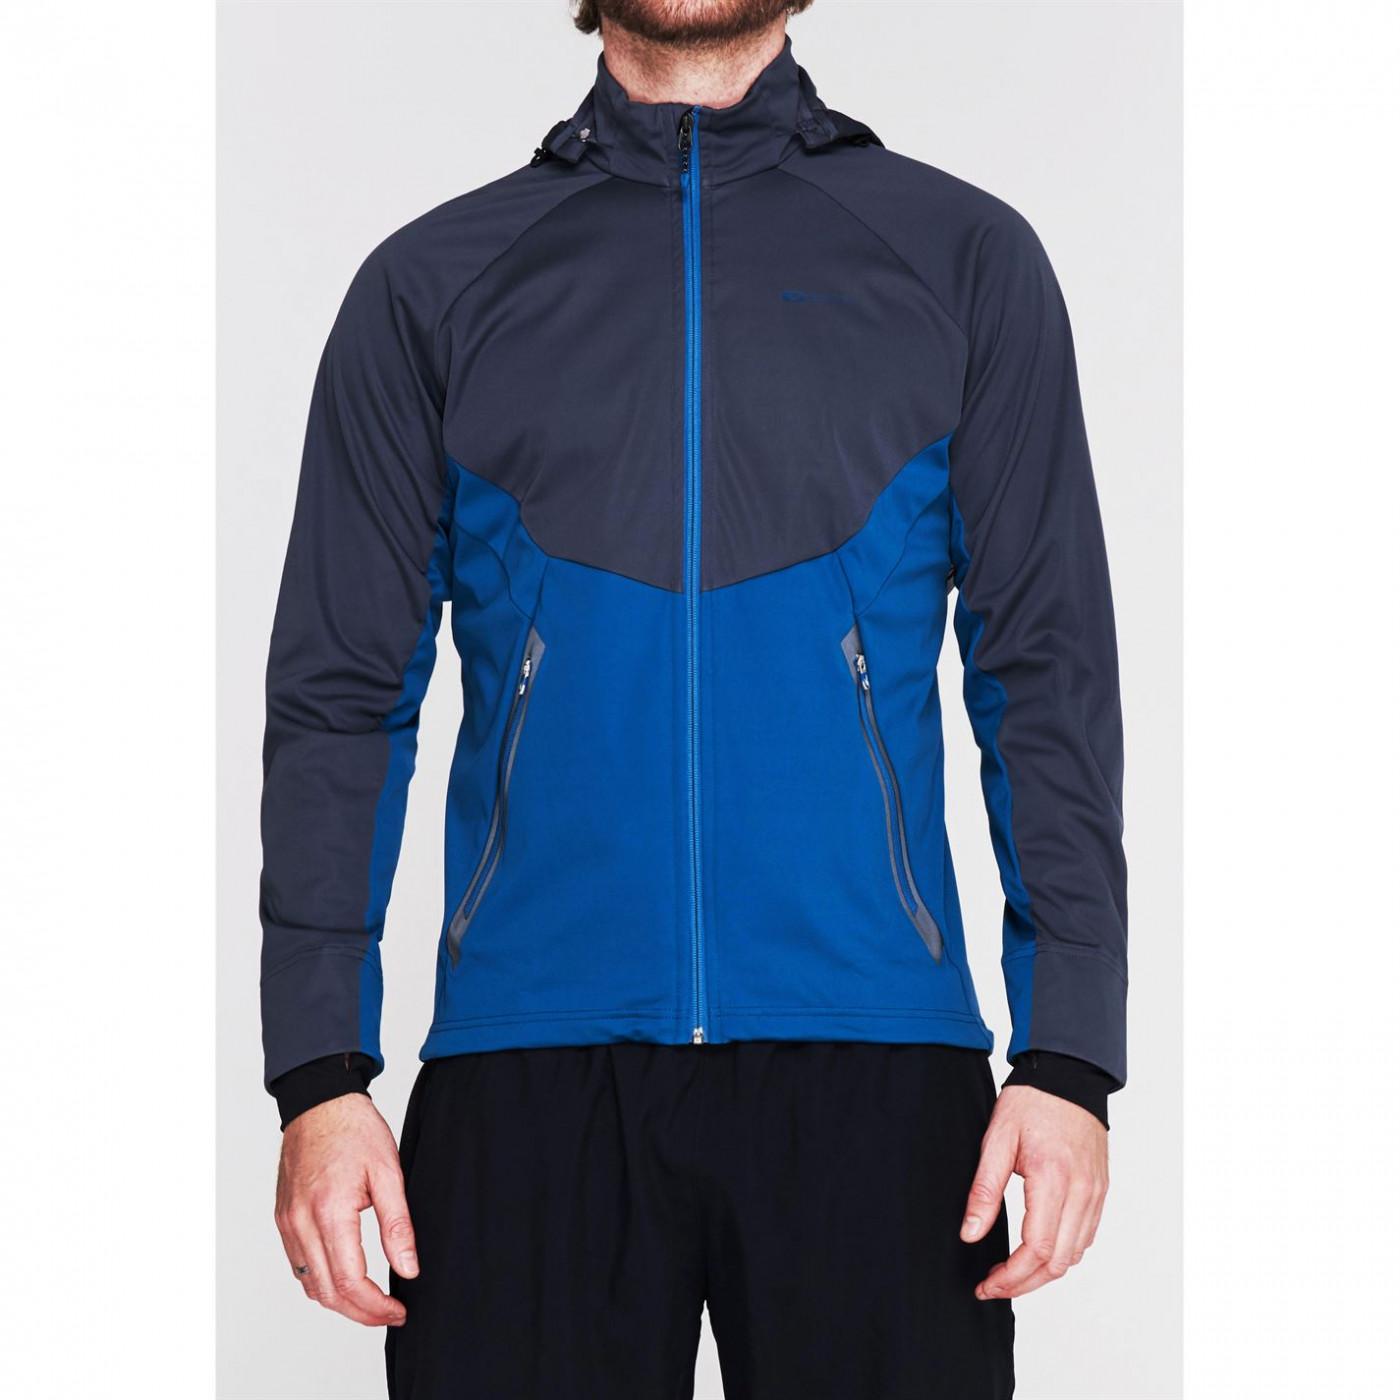 Sugoi Firewall 180 Cycling Jacket Mens